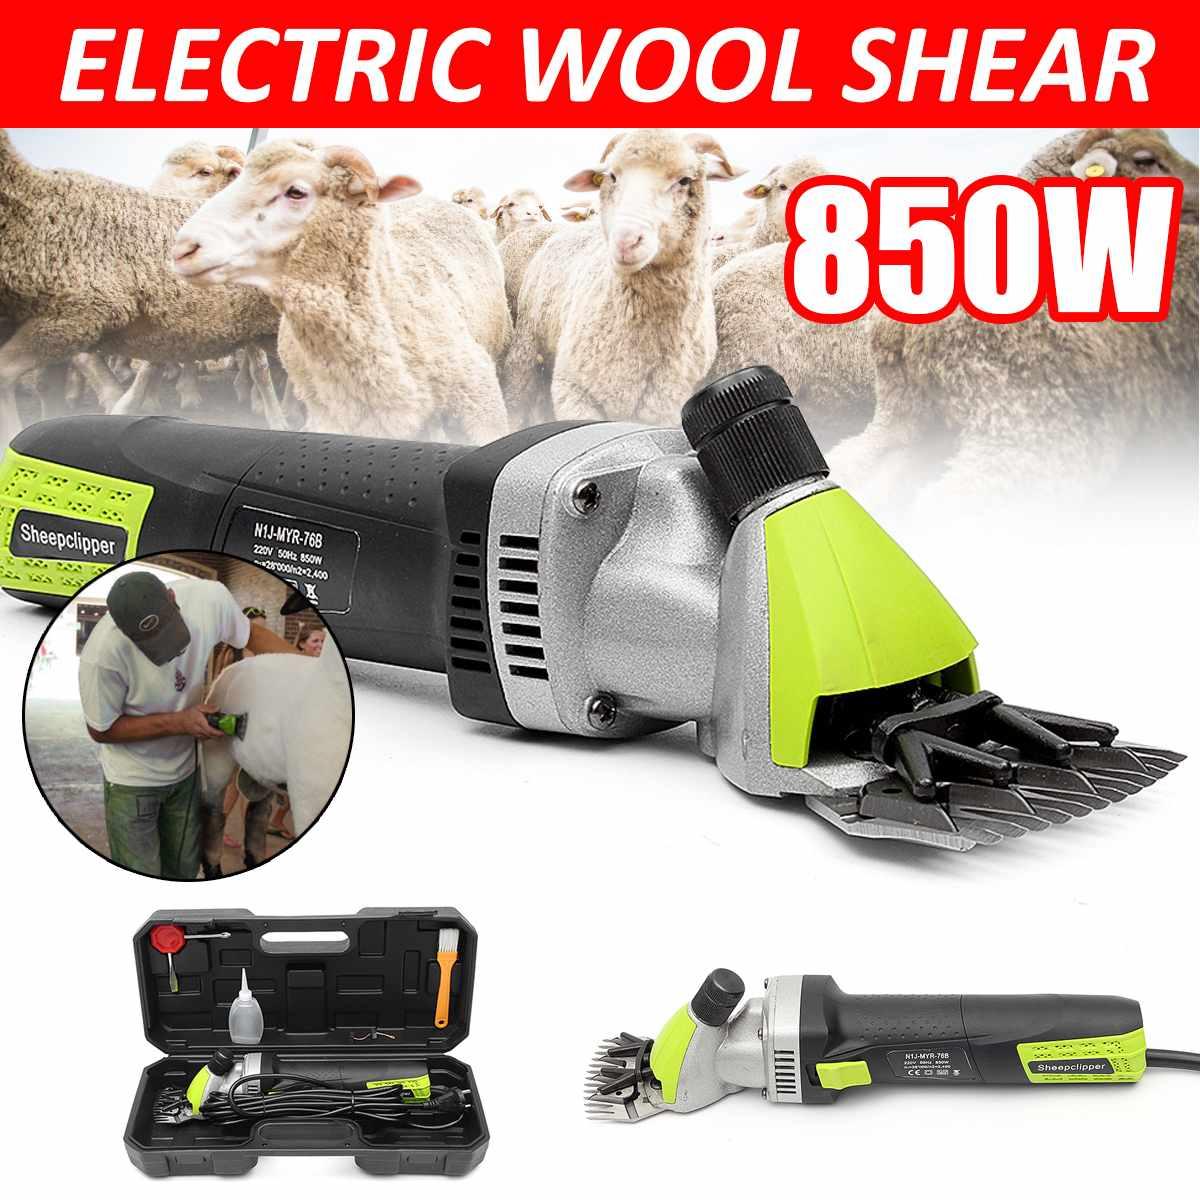 850 W חשמלי צמר גז כבשים עזים גוזז שיער בעלי חיים גז מכונה גוזם כלי 220 V חותך צמר מספריים עבור משק בית